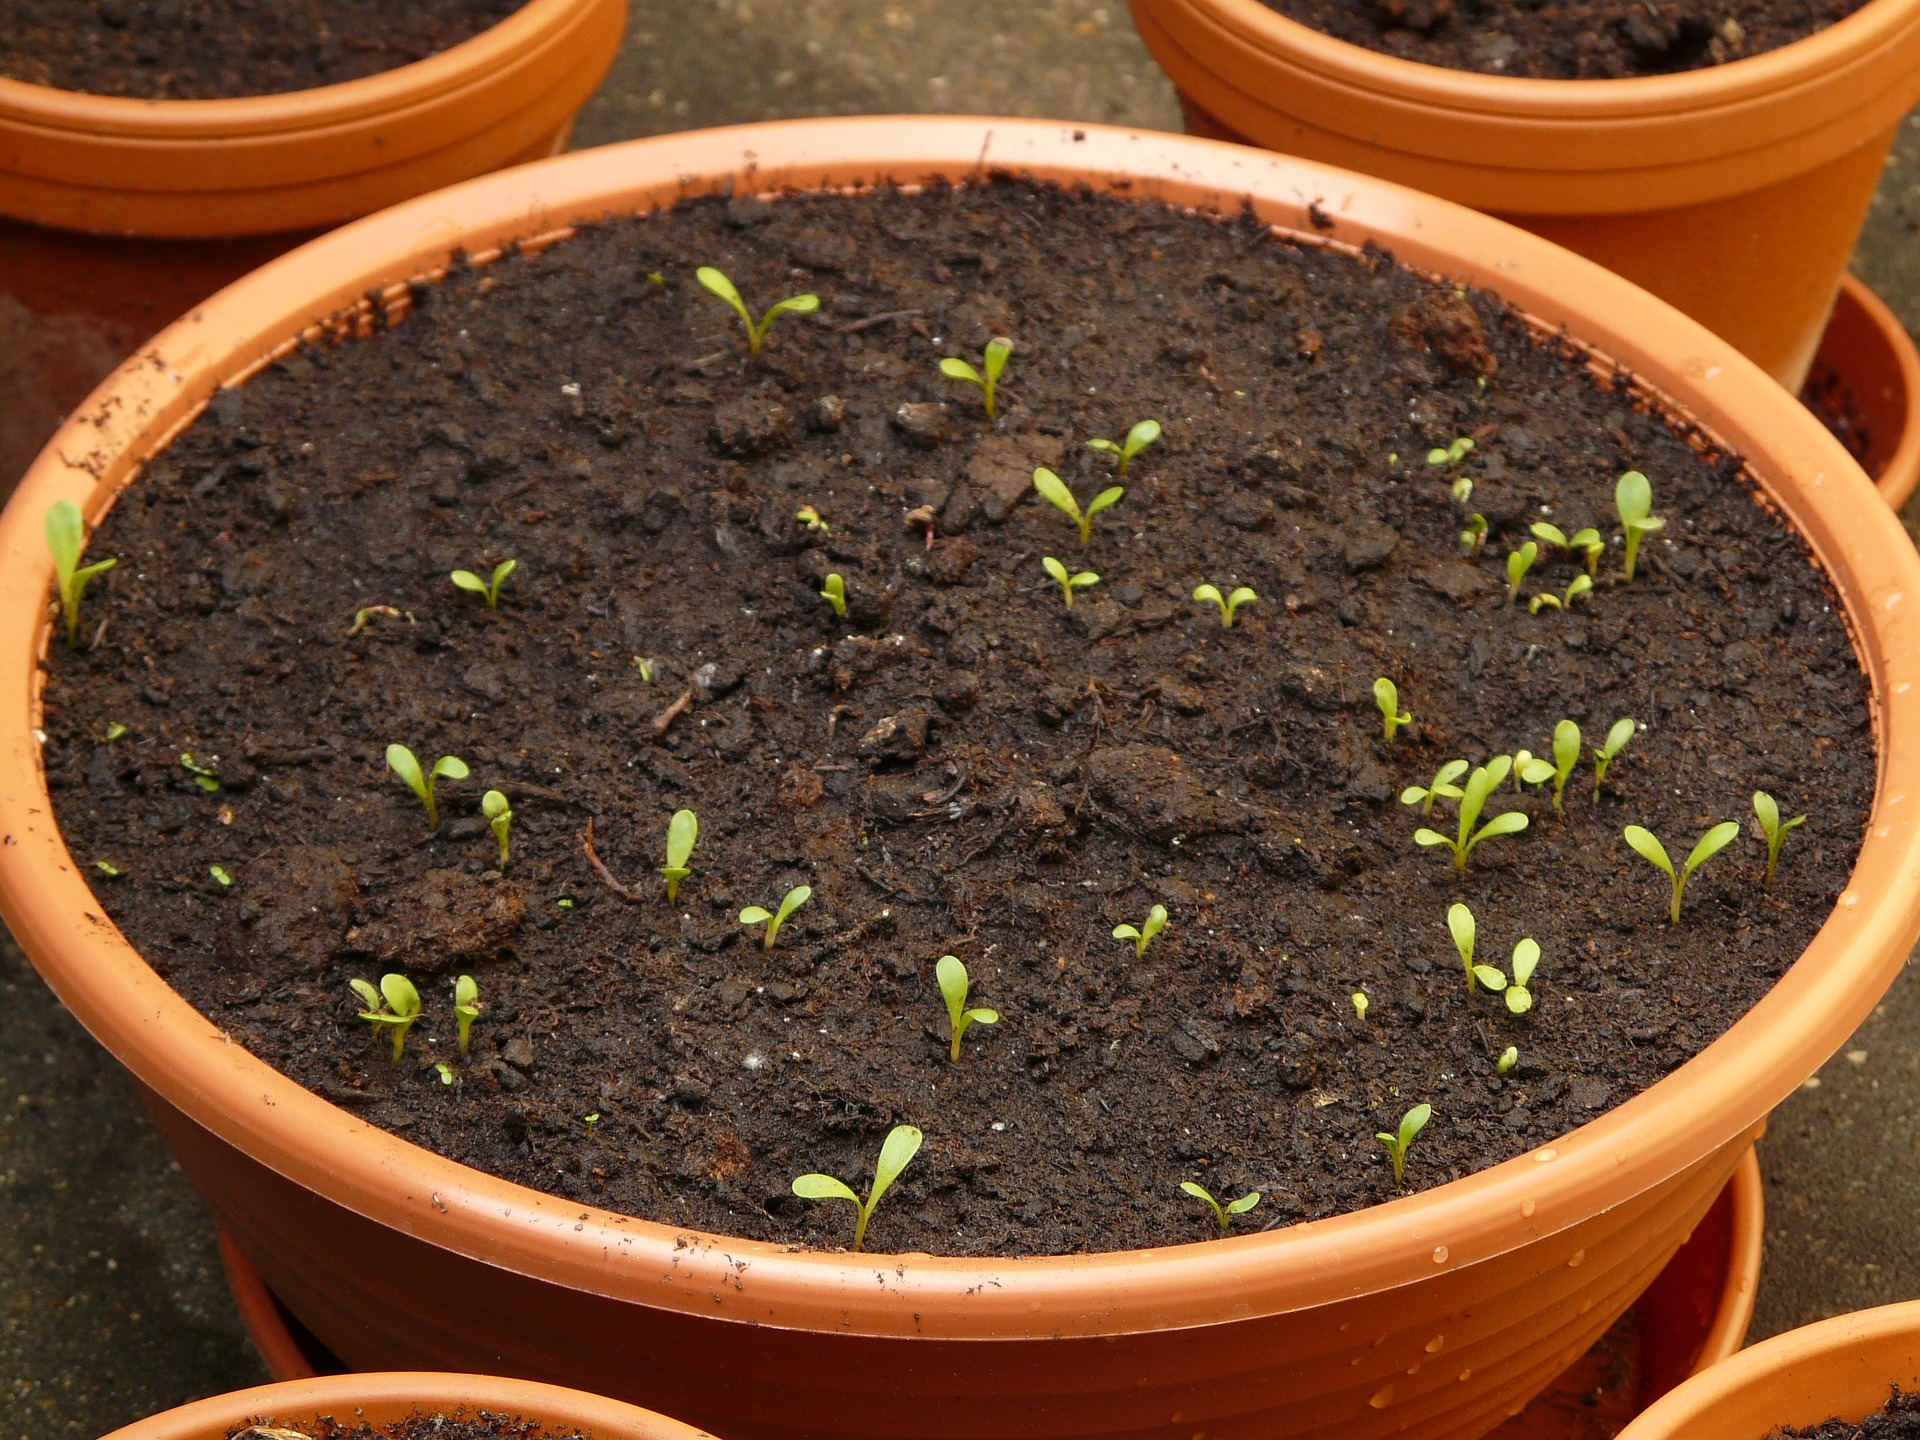 Dünger: seed